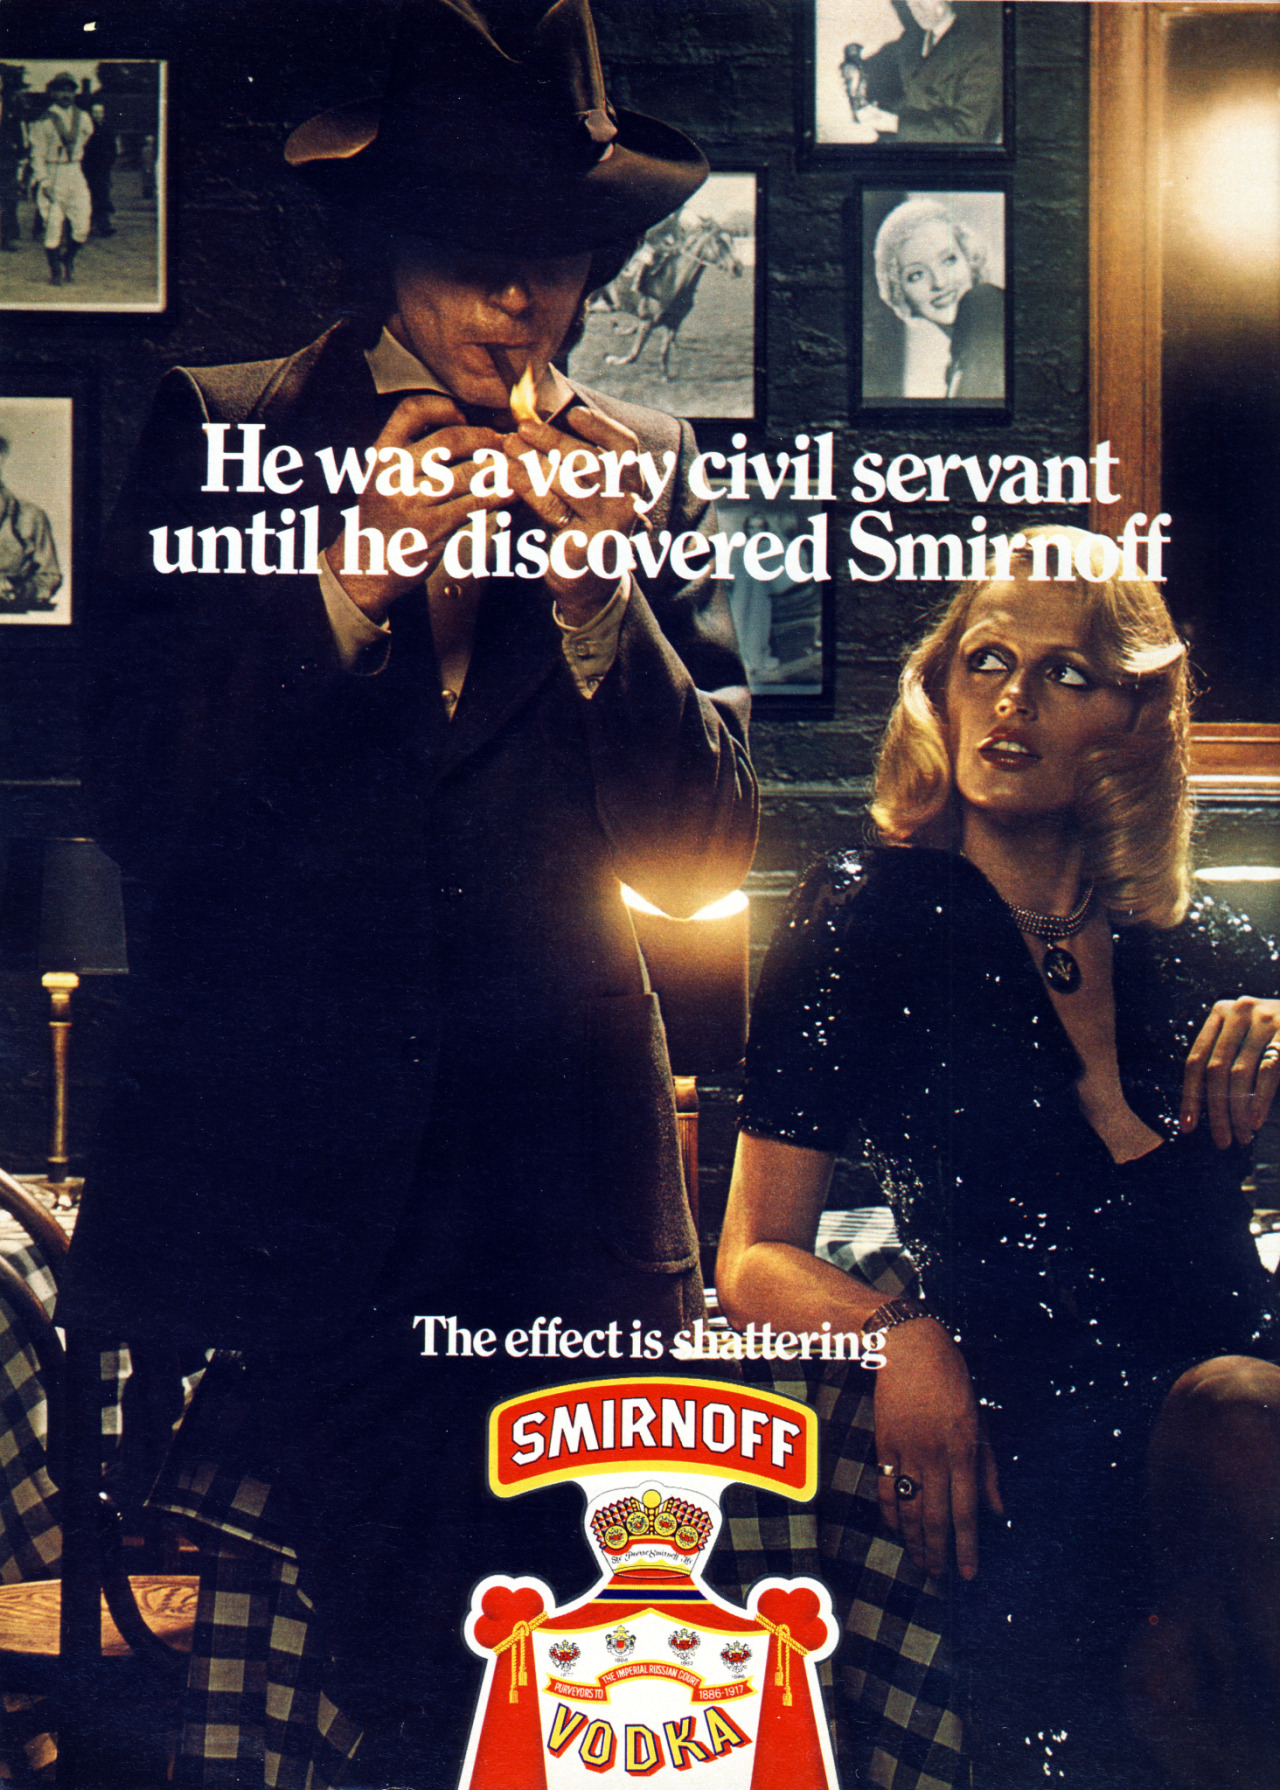 Smirnoff I Used to be a very civil servant